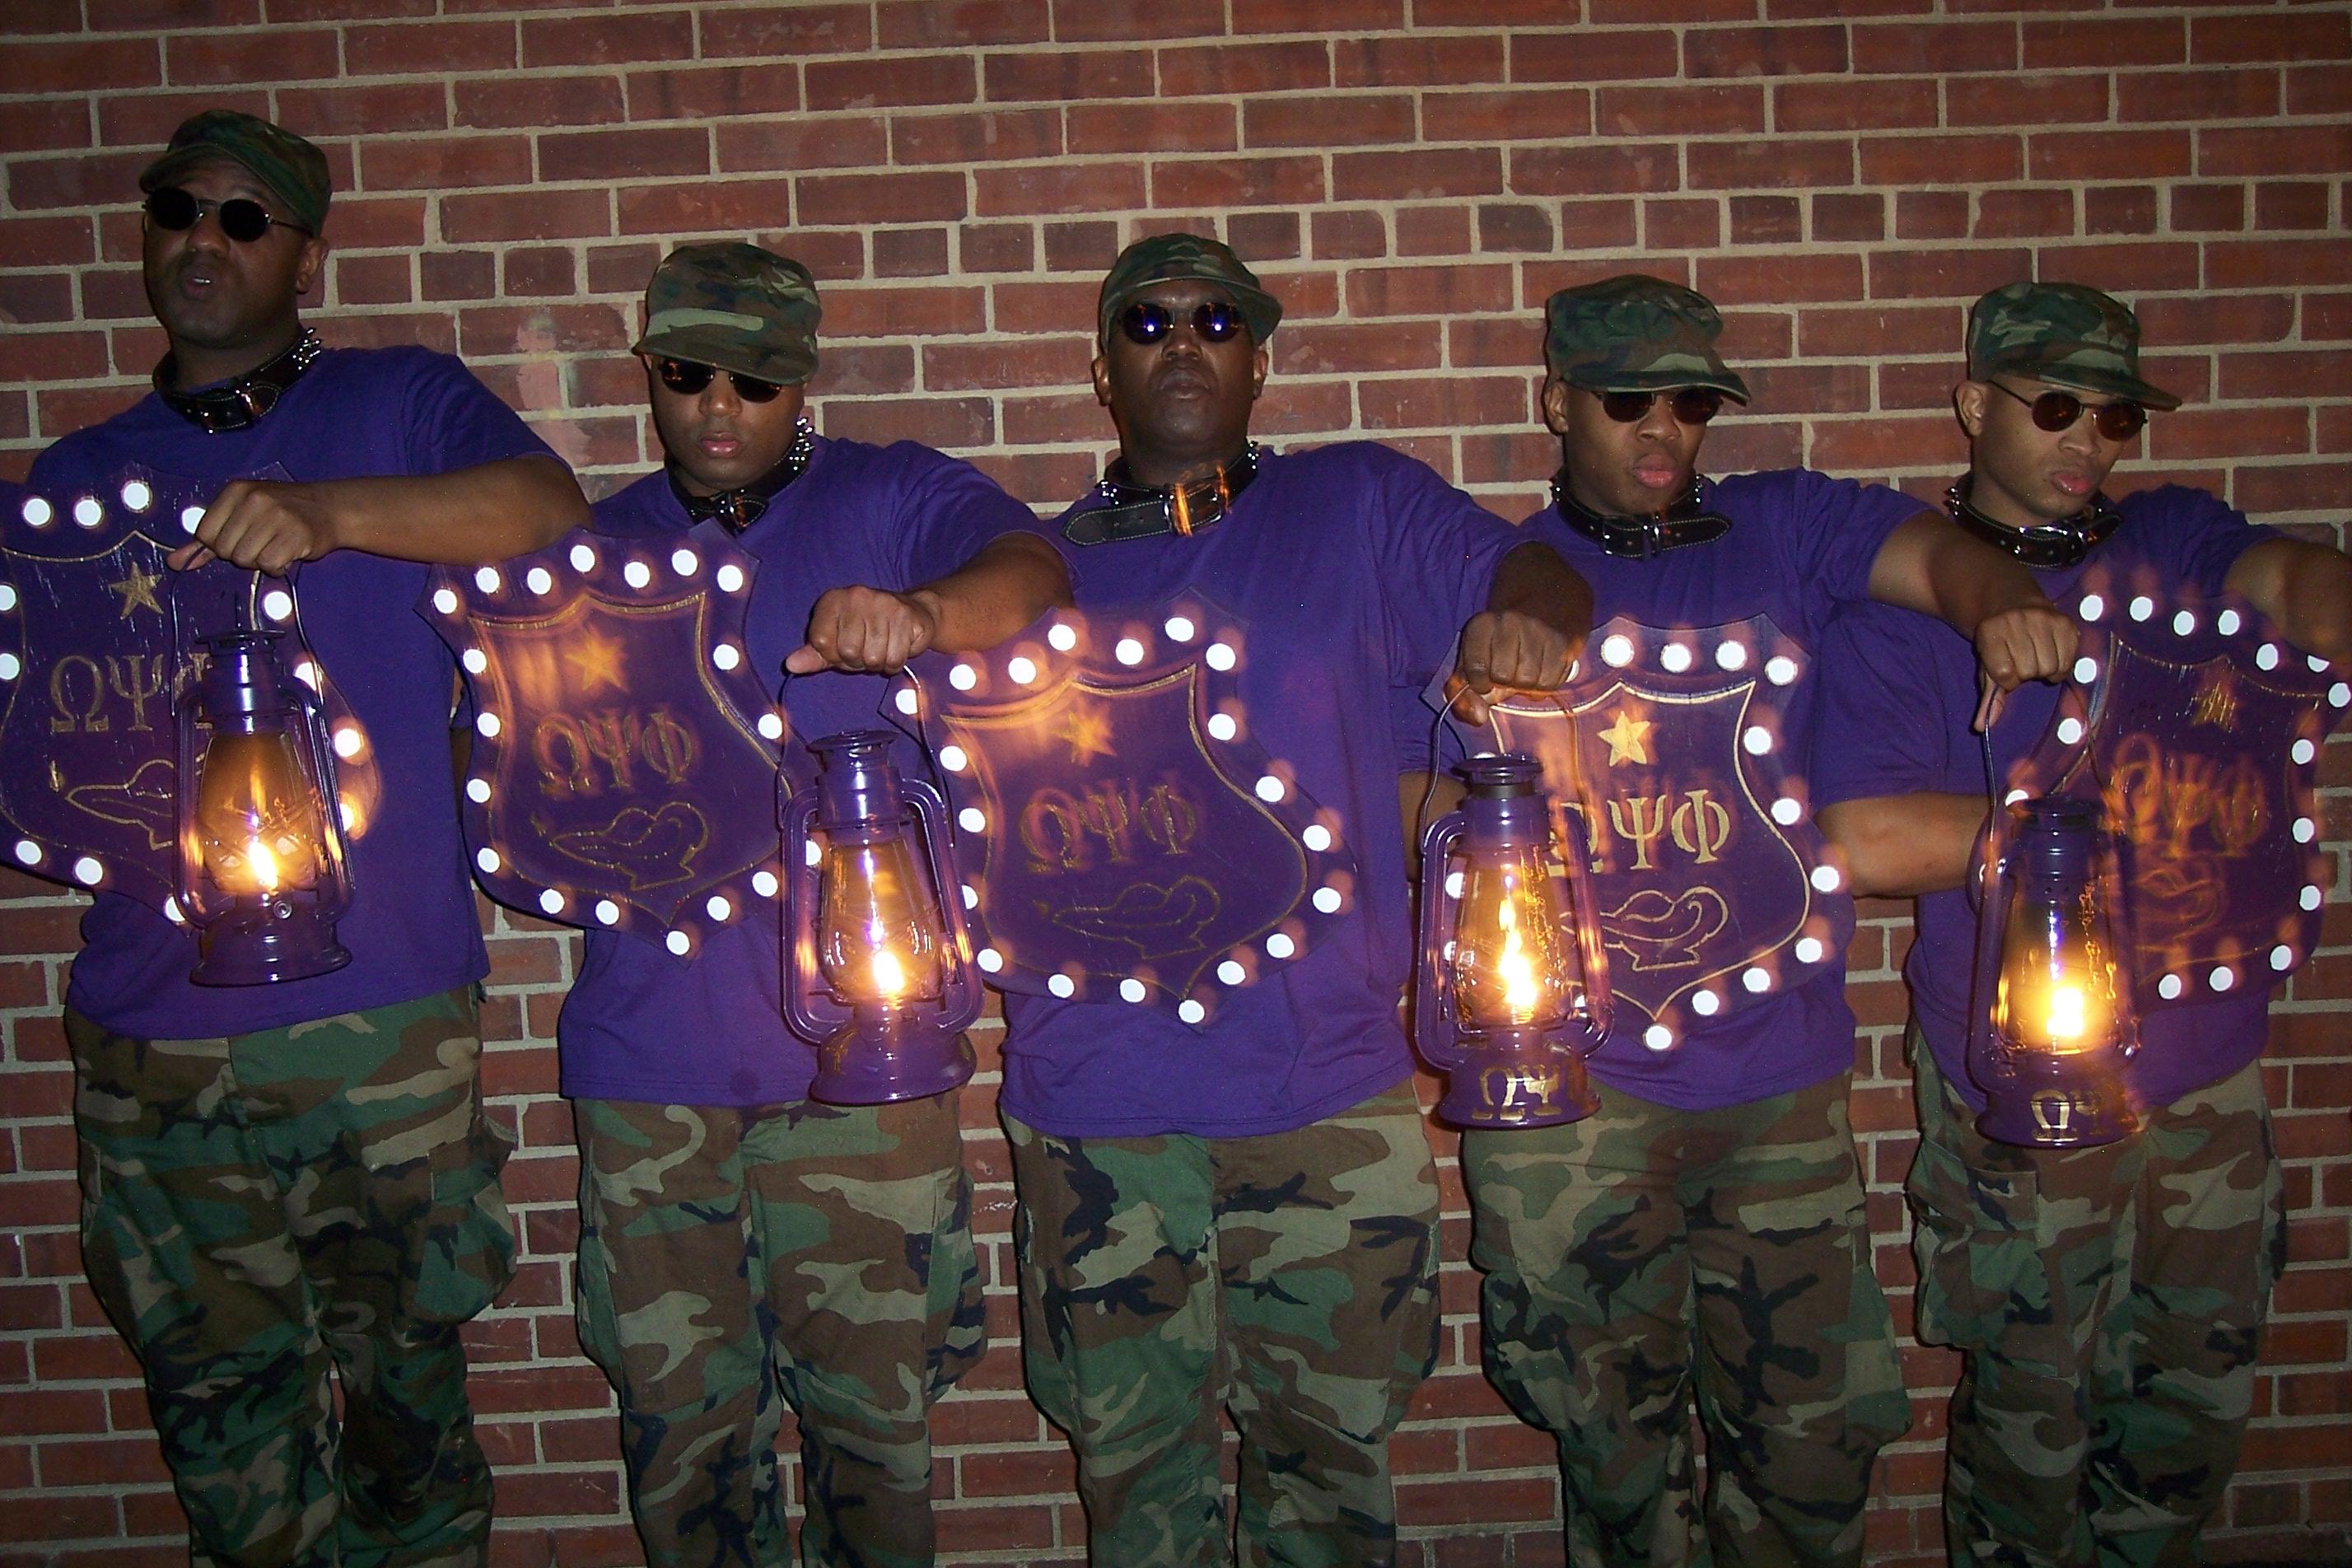 Hostage Takers Spr 2008